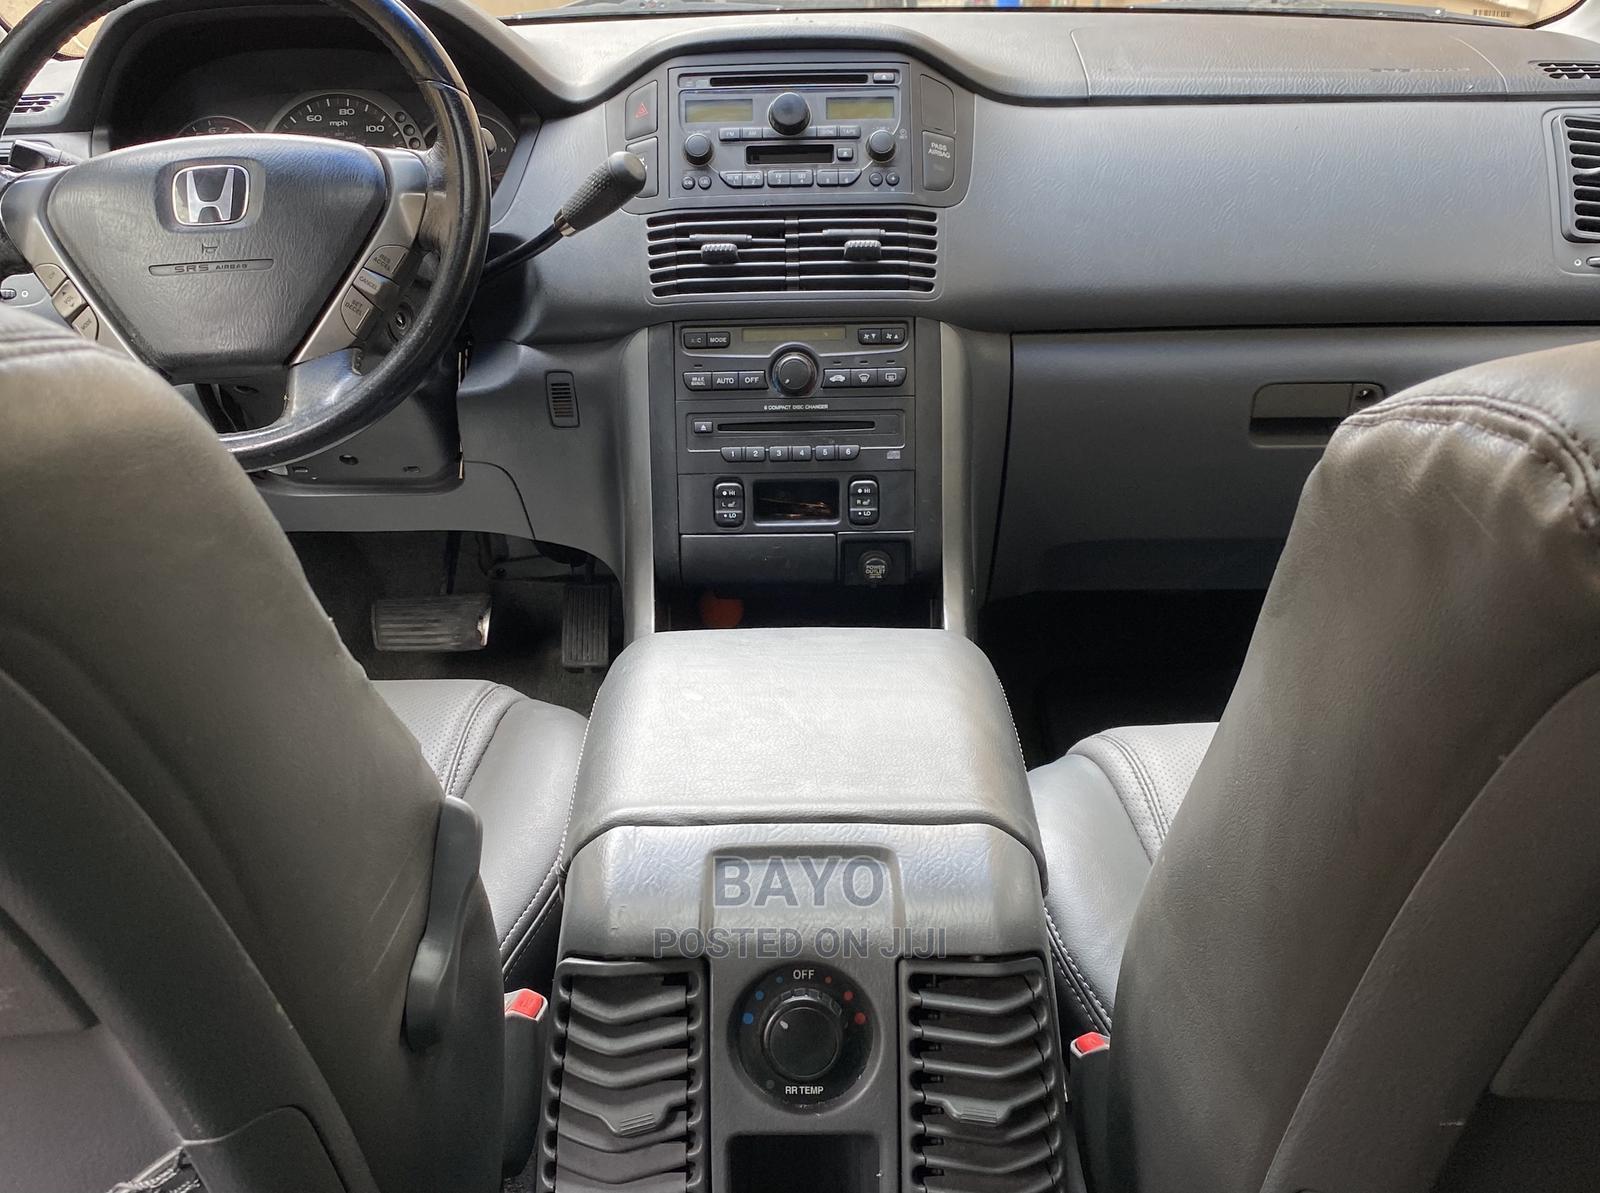 Archive: Honda Pilot 2005 EX-L 4x4 (3.5L 6cyl 5A) Black